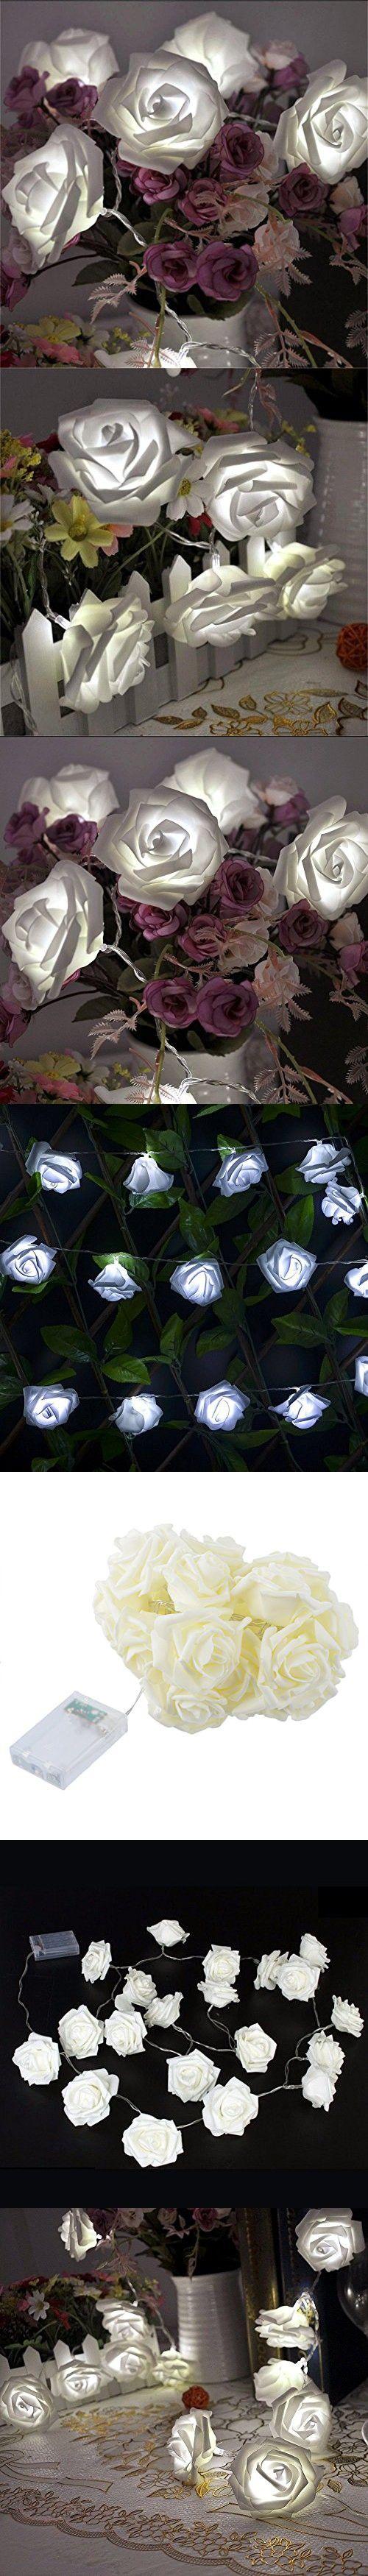 Best 25 Led Fairy Lights Ideas On Pinterest Exterior